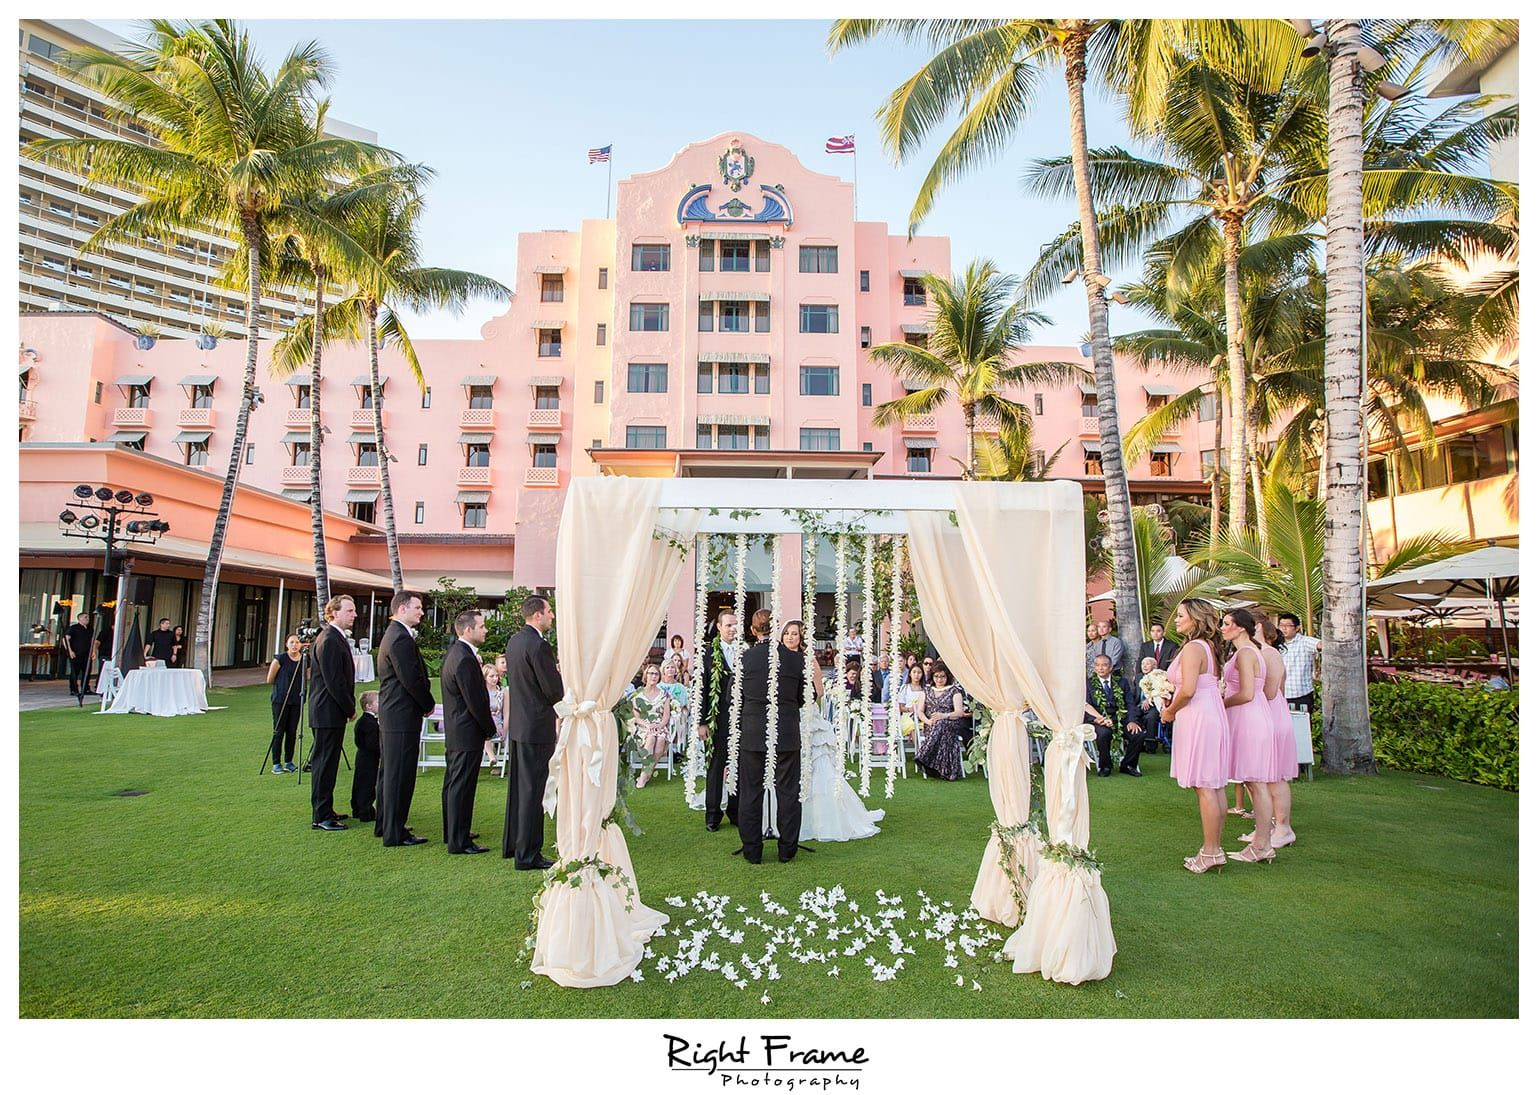 Rightframe Wedding Ceremony At Royal Hawaiian Hotel Waikiki Oahu Hawaii Photography Ideas